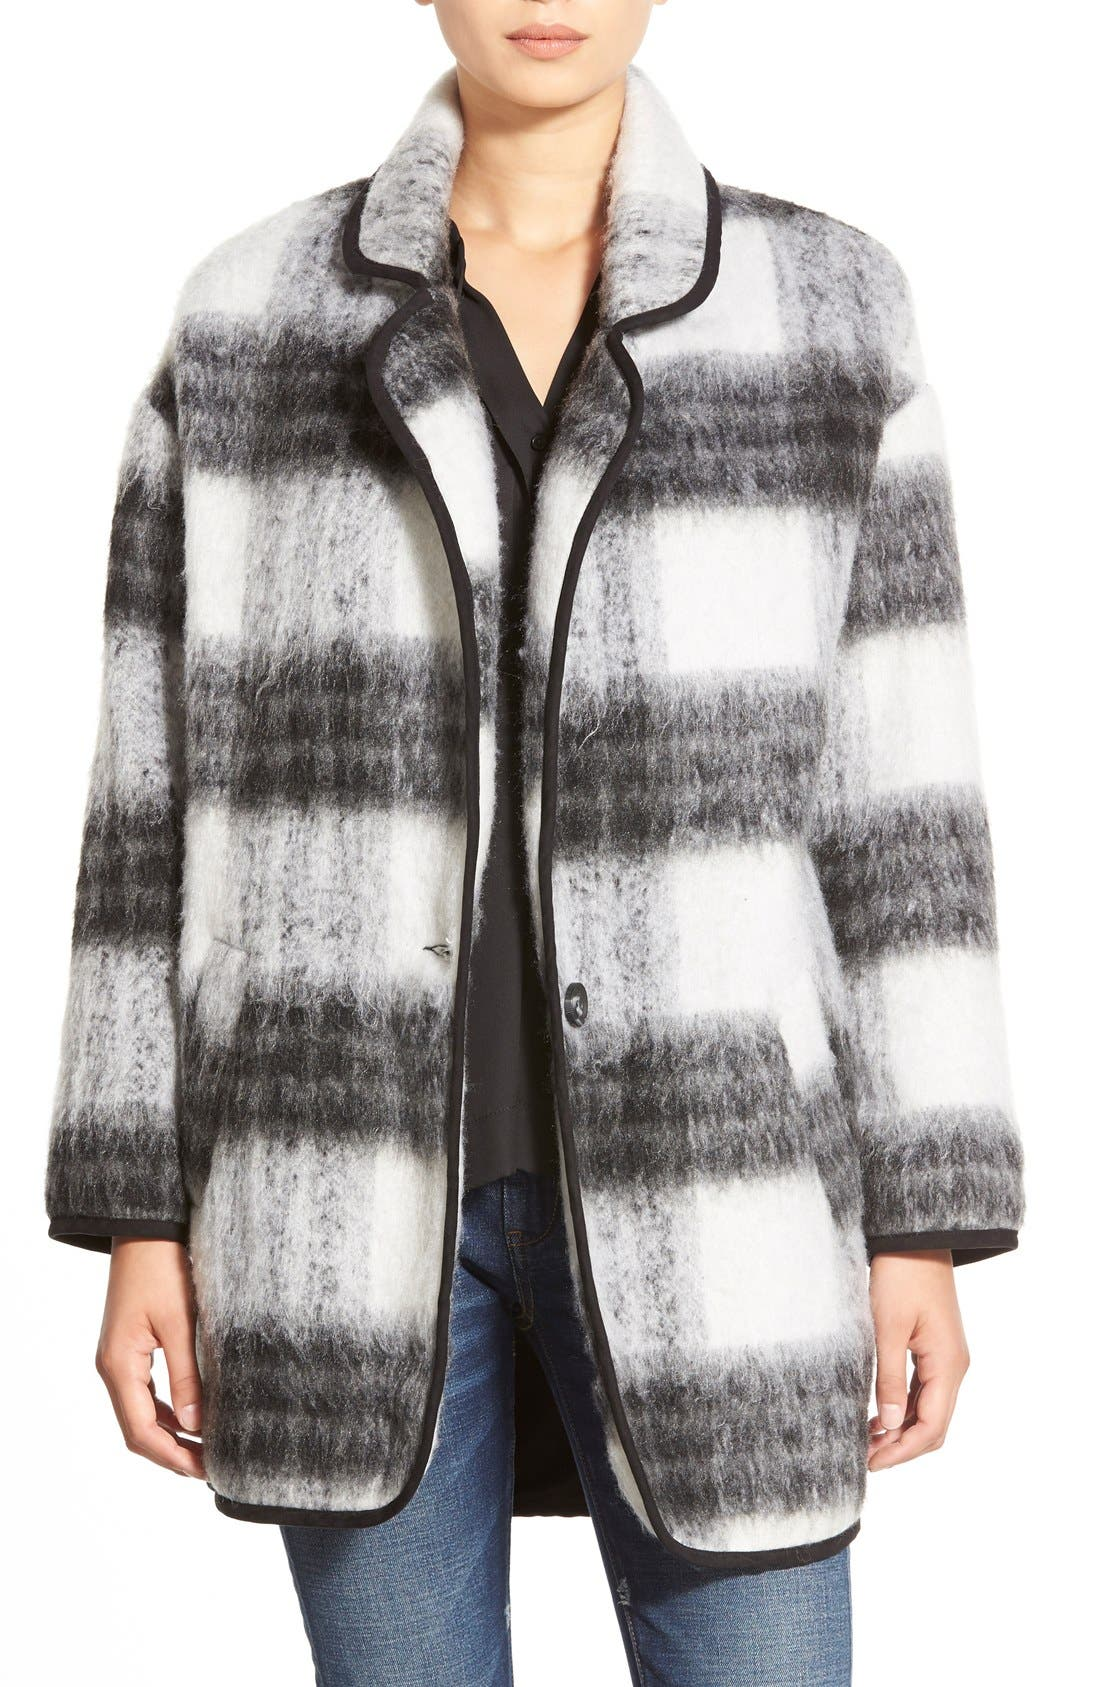 ASTR Two Tone Fuzzy Plaid Jacket, Main, color, 009